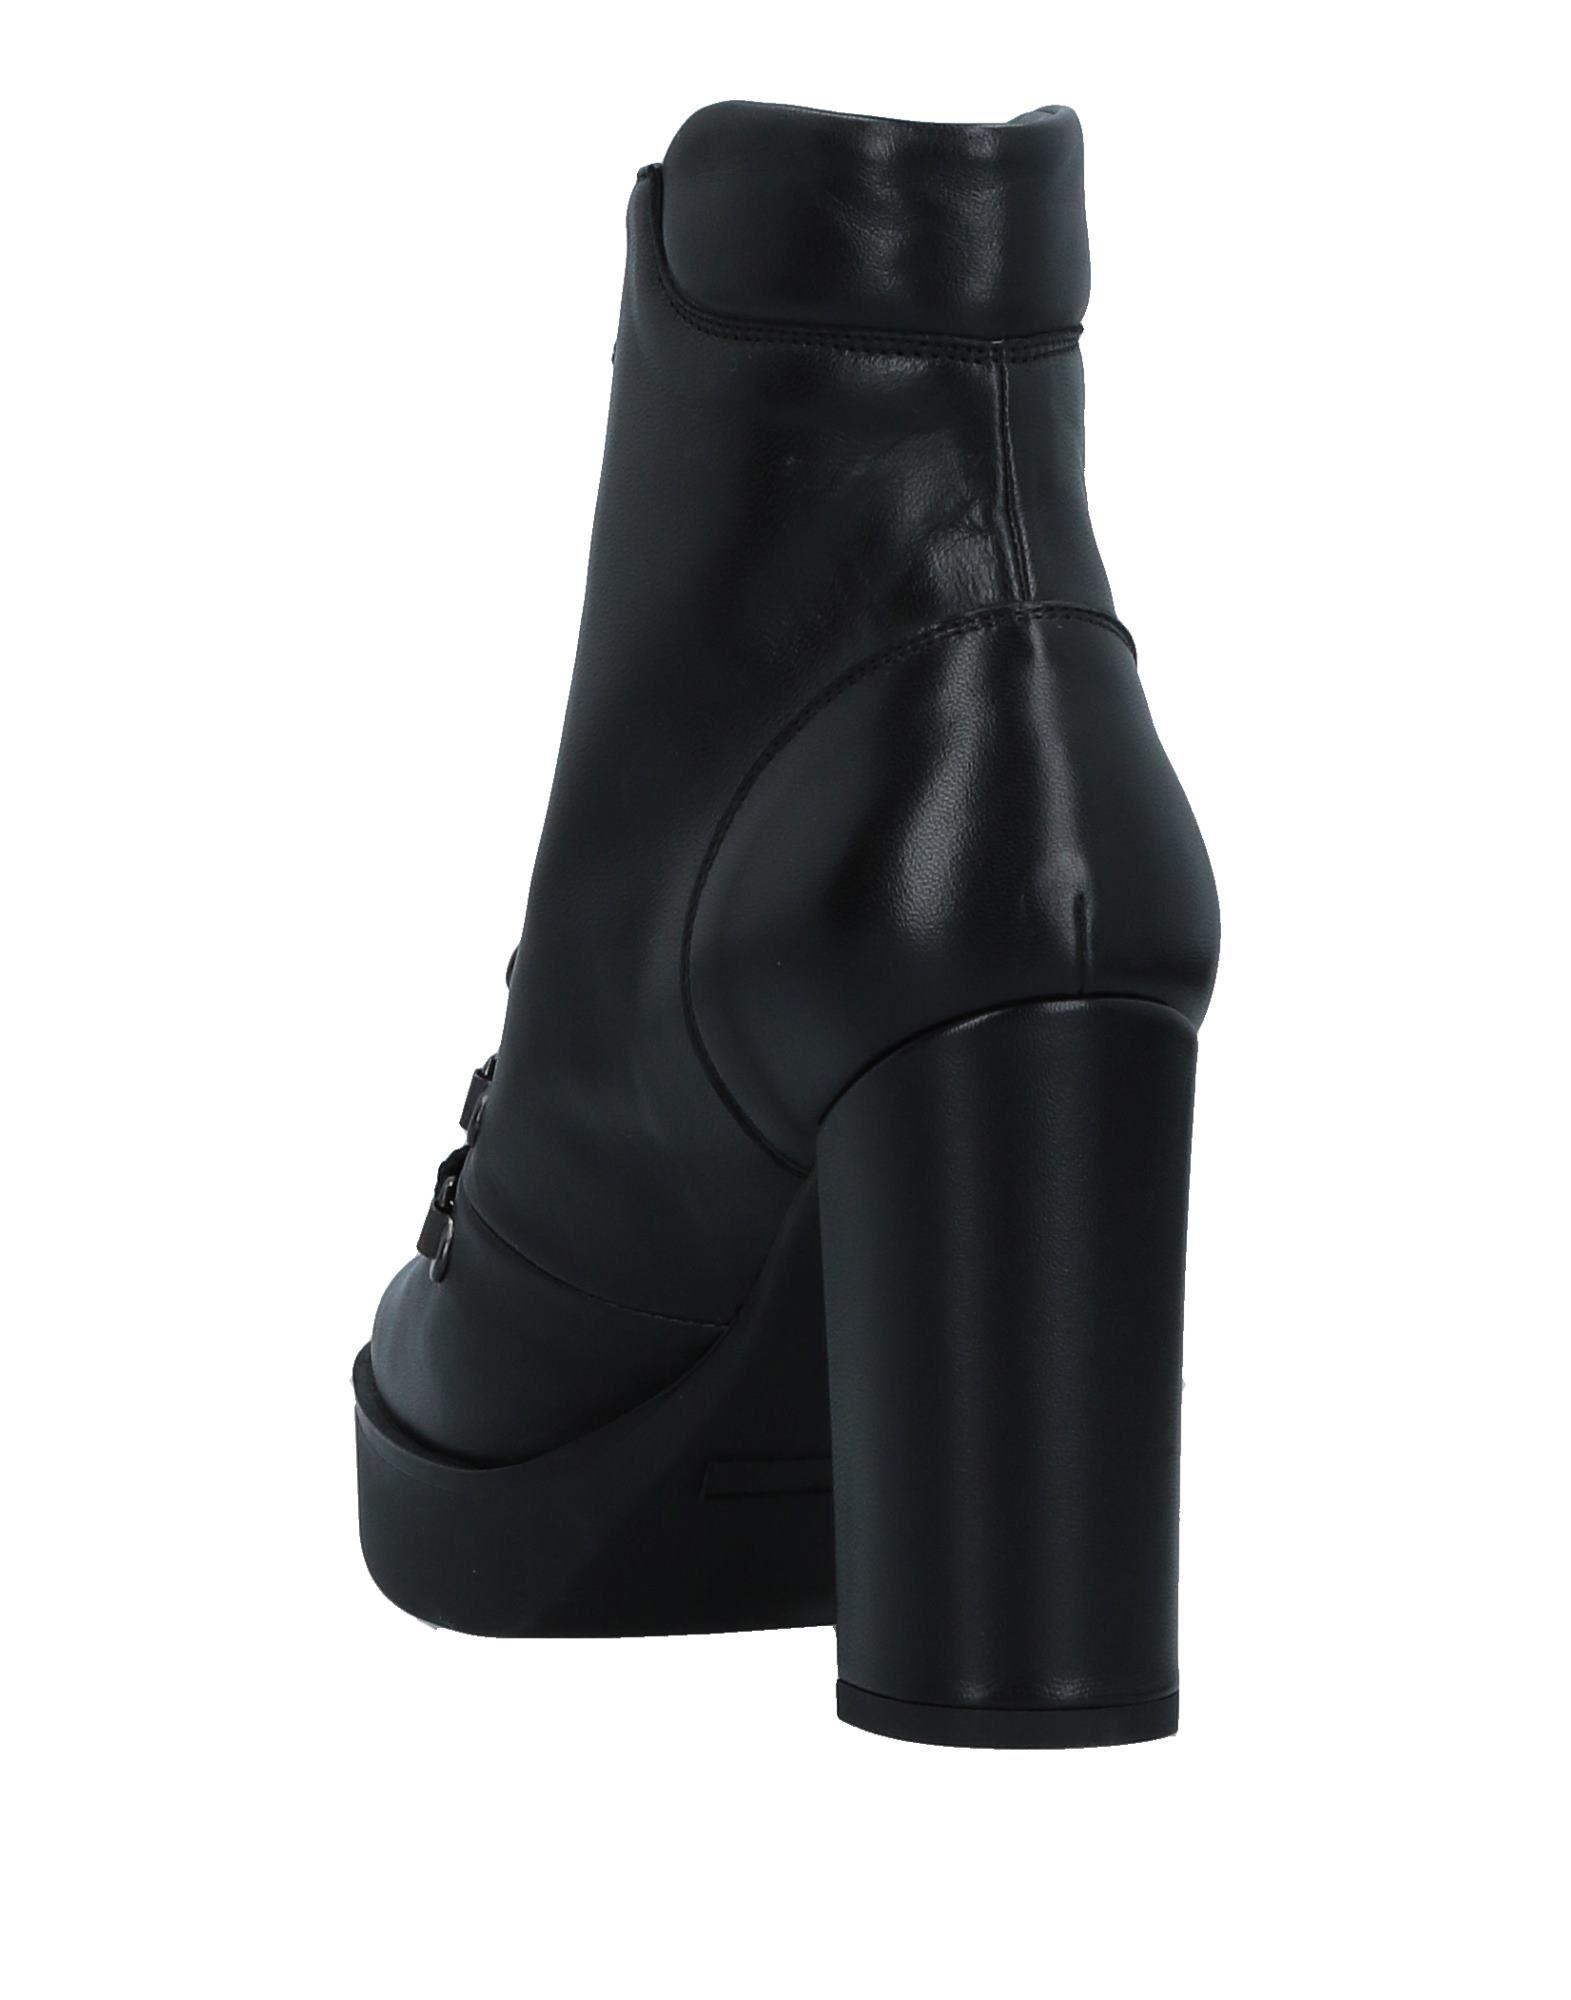 Stilvolle billige Stiefelette Schuhe By A. Stiefelette billige Damen  11516393RR 4cc5fa